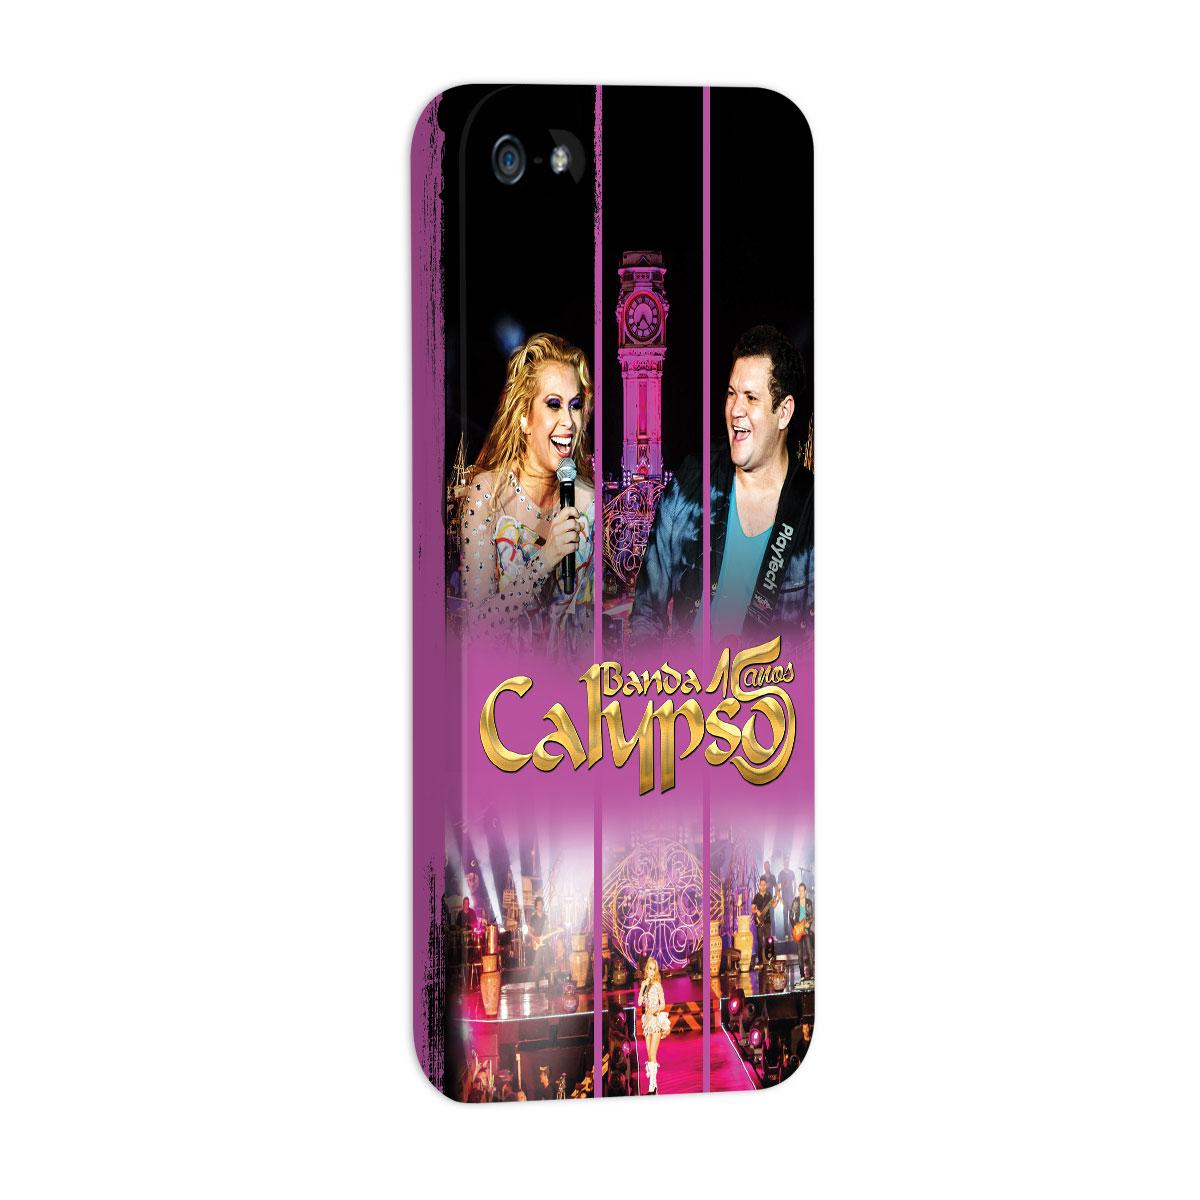 Capa de iPhone 5/5S Calypso 15 Anos